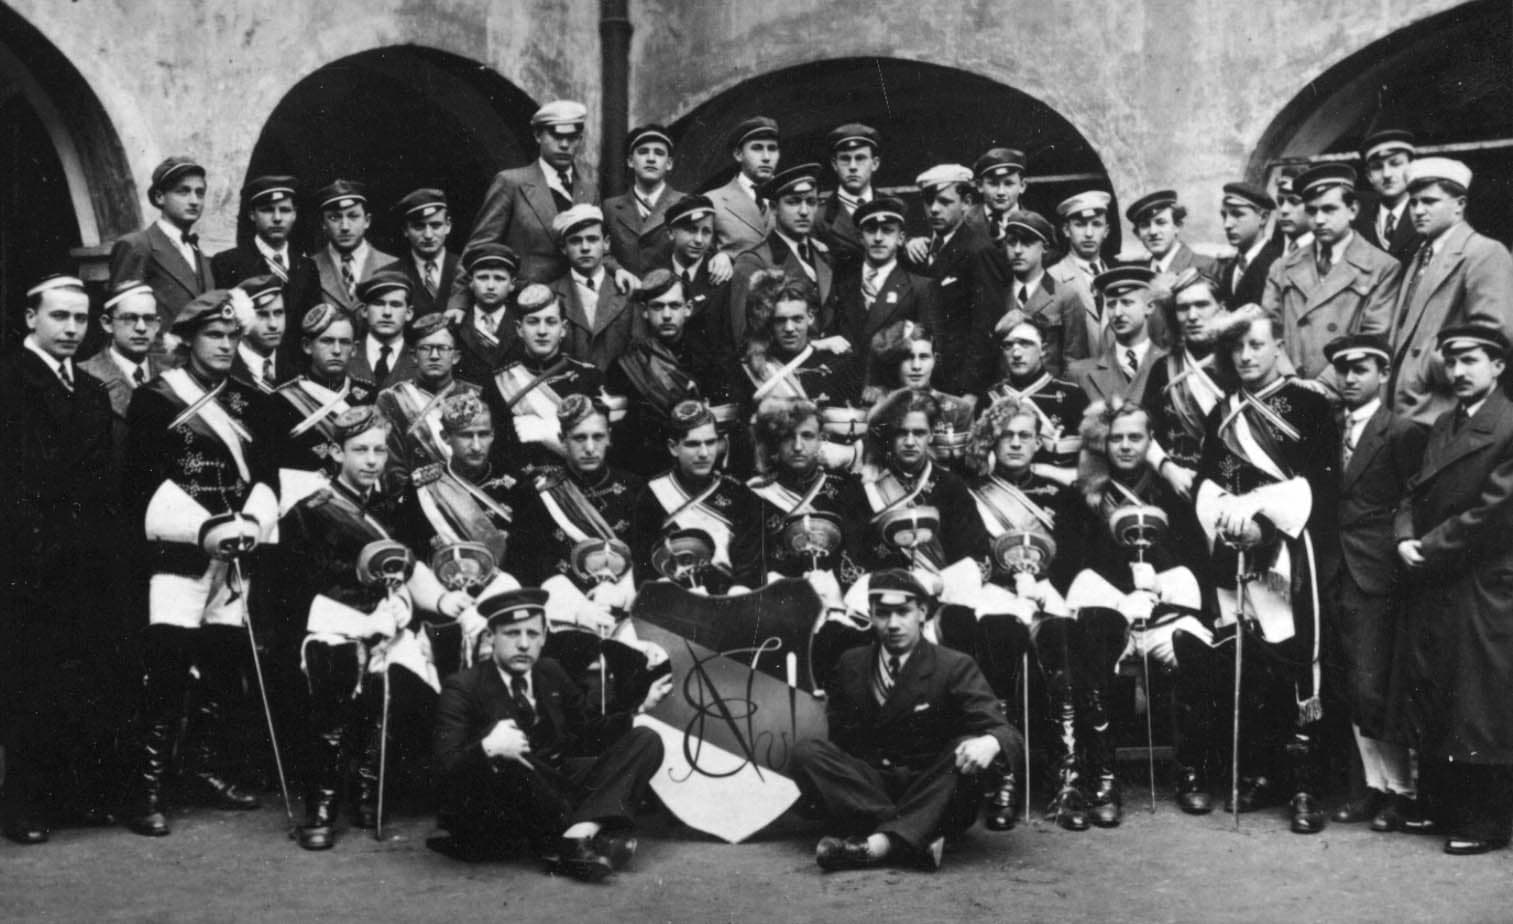 1937-04-10 Nibelungia Klagenfurt